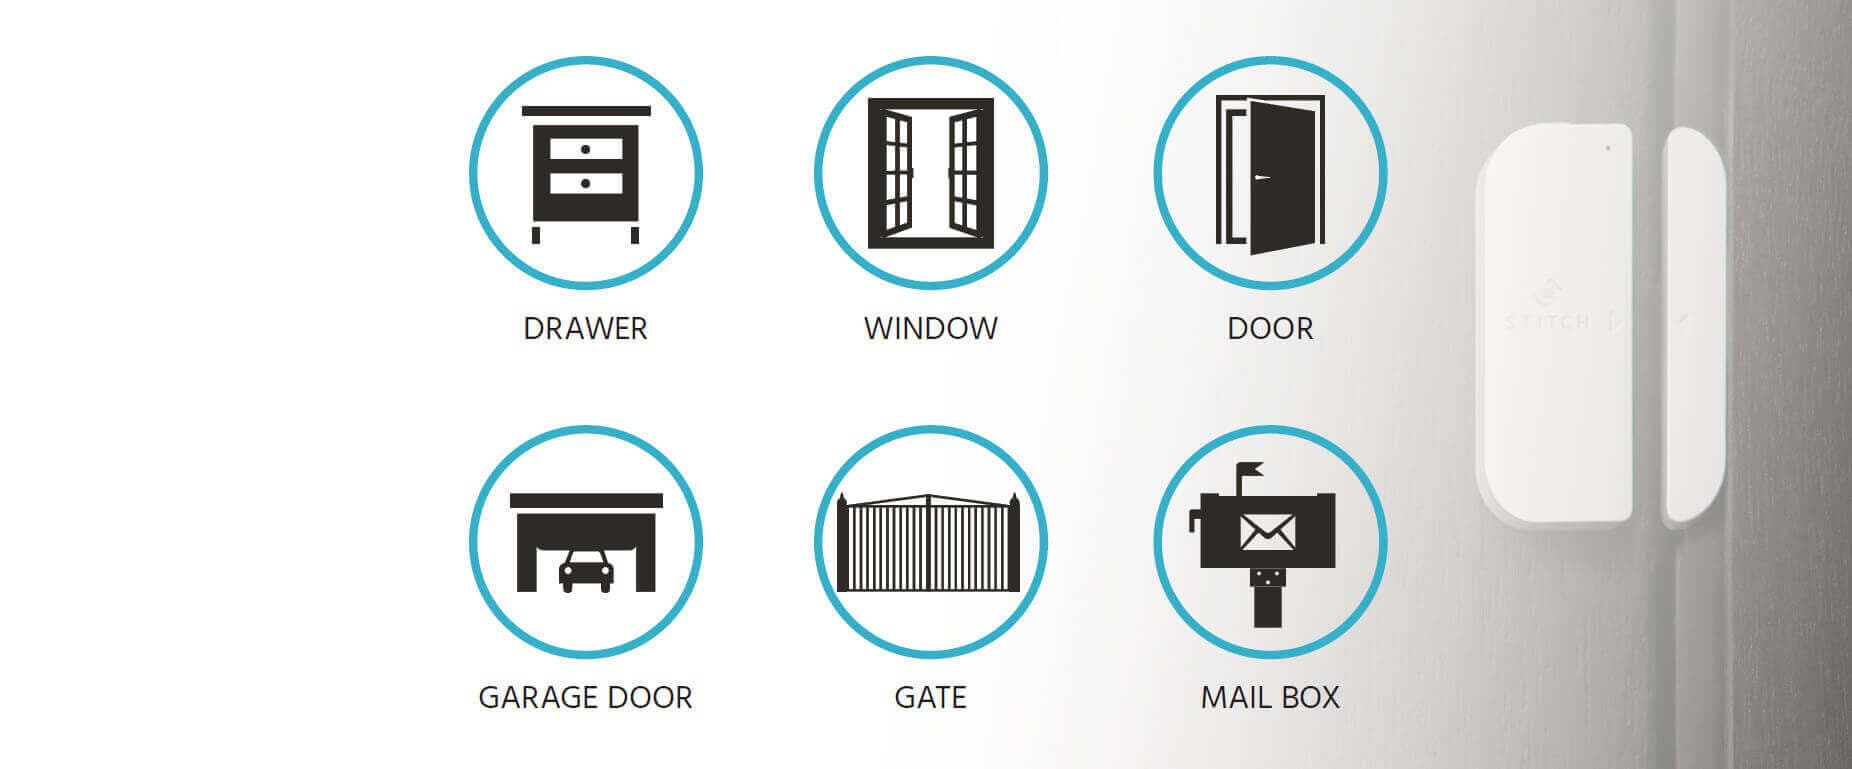 STITCH by Monoprice Wireless Smart Door/Window Sensor